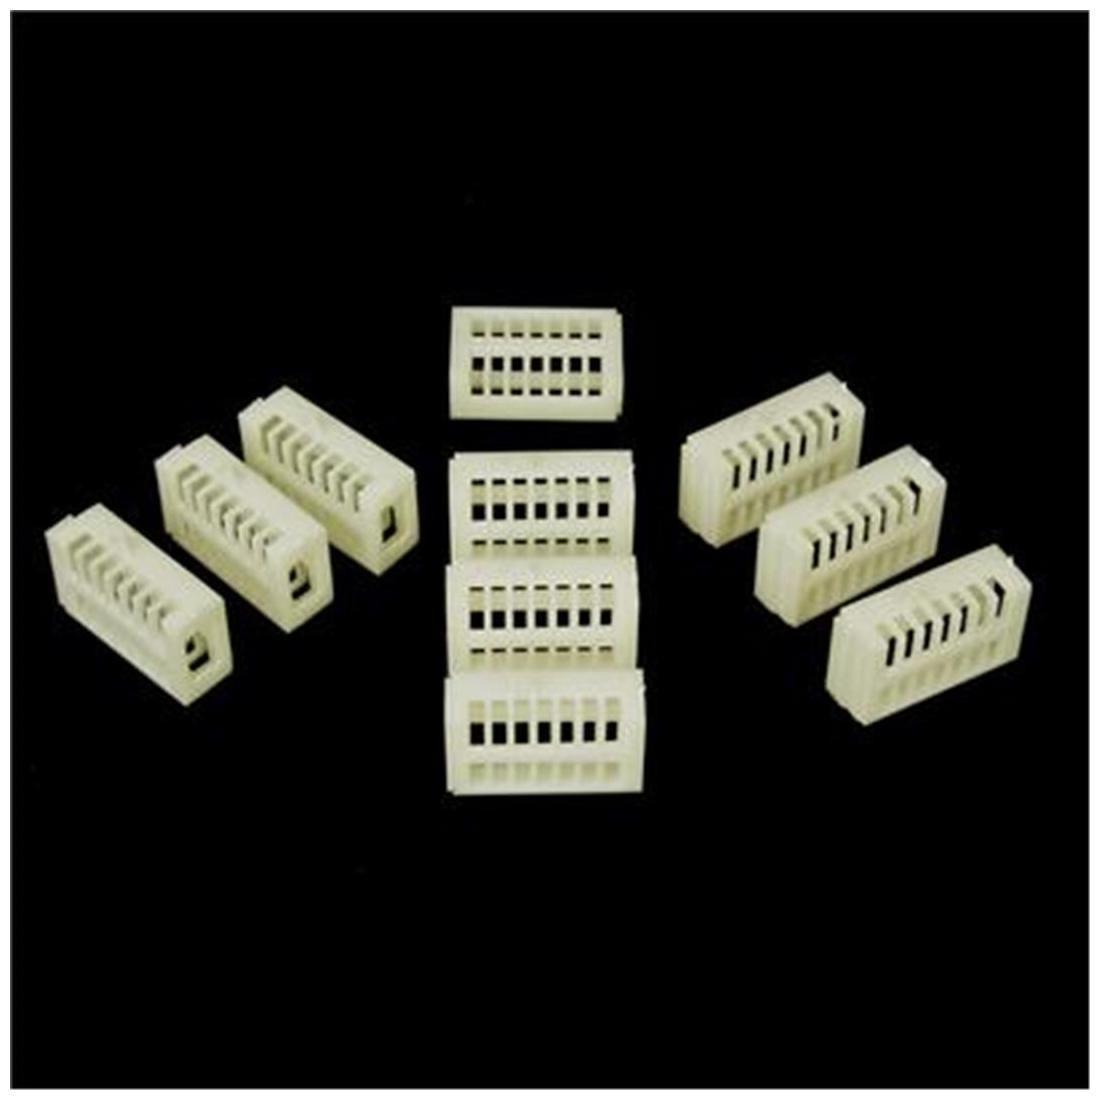 ADG804YRMZ-REEL7 IC MULTIPLEXER 4X1 10MSOP G804YRMZ-REEL7 804 G804 1PCS